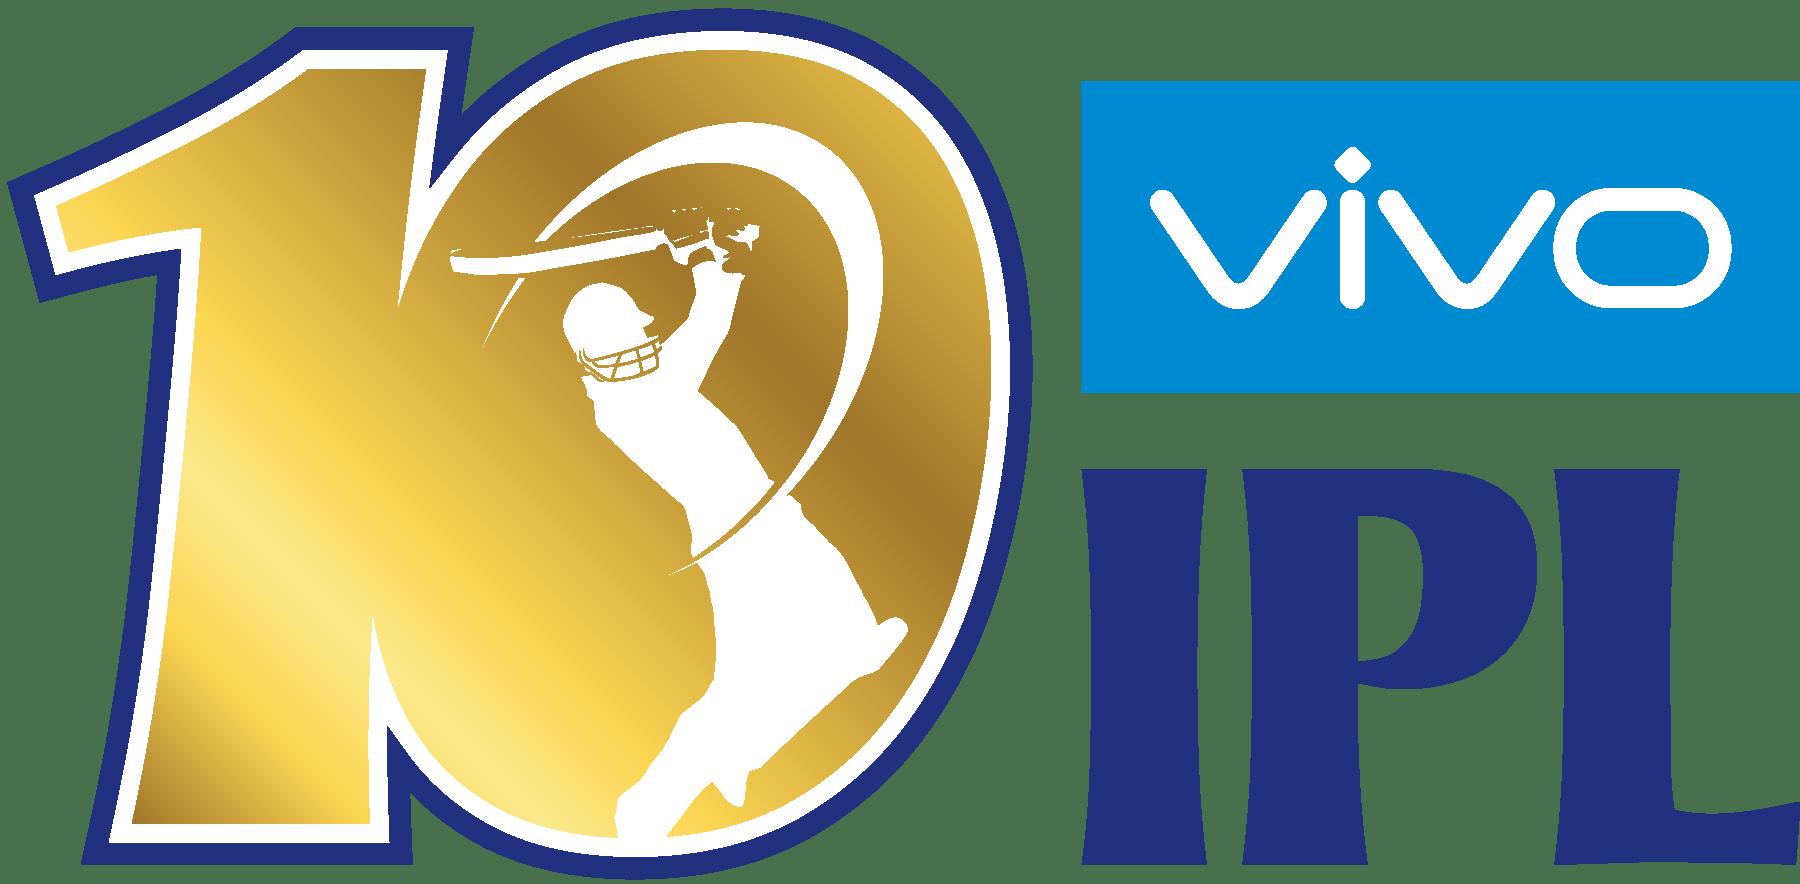 Indian Premier League (IPL) Logo Download Vector.